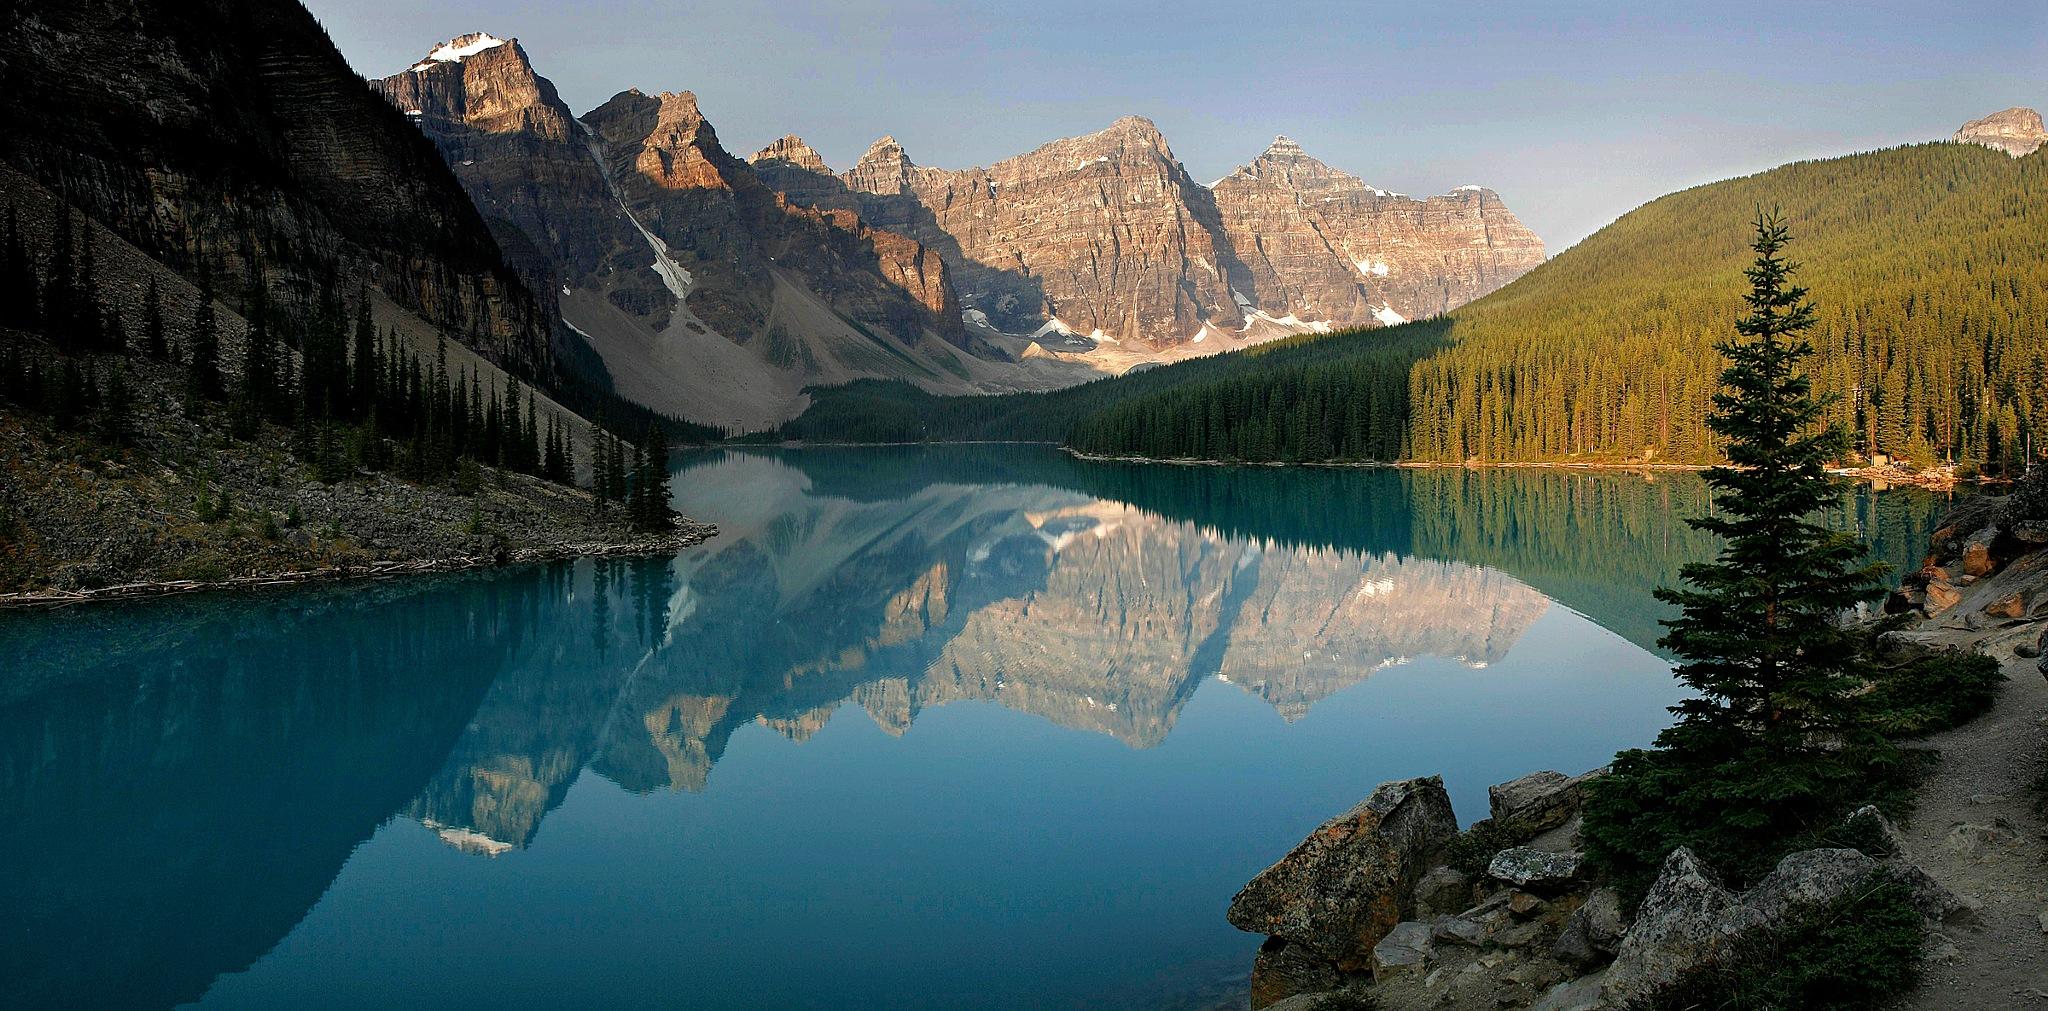 Moraine Lake Panorama by Carl Main